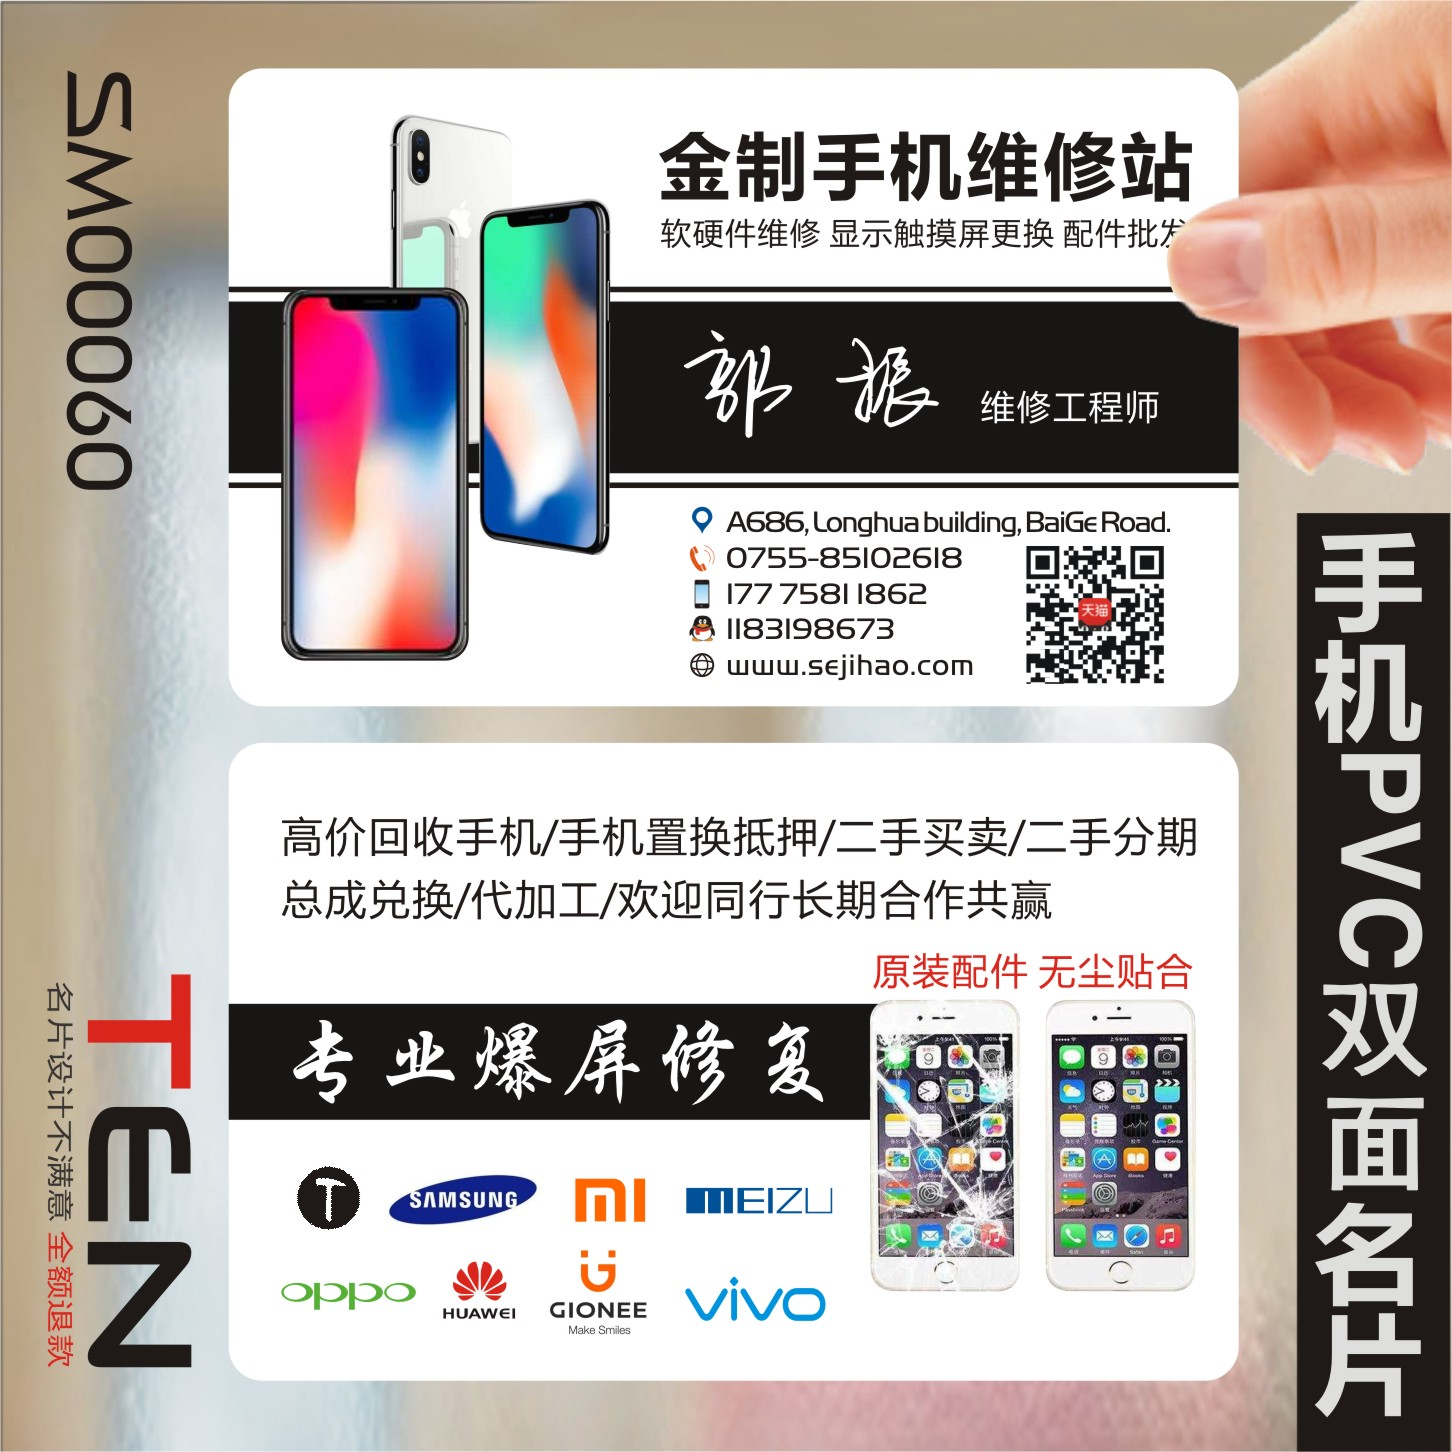 PVC塑料双面手机店通讯数码电脑家电维修名片免费设计制作包邮SM00040